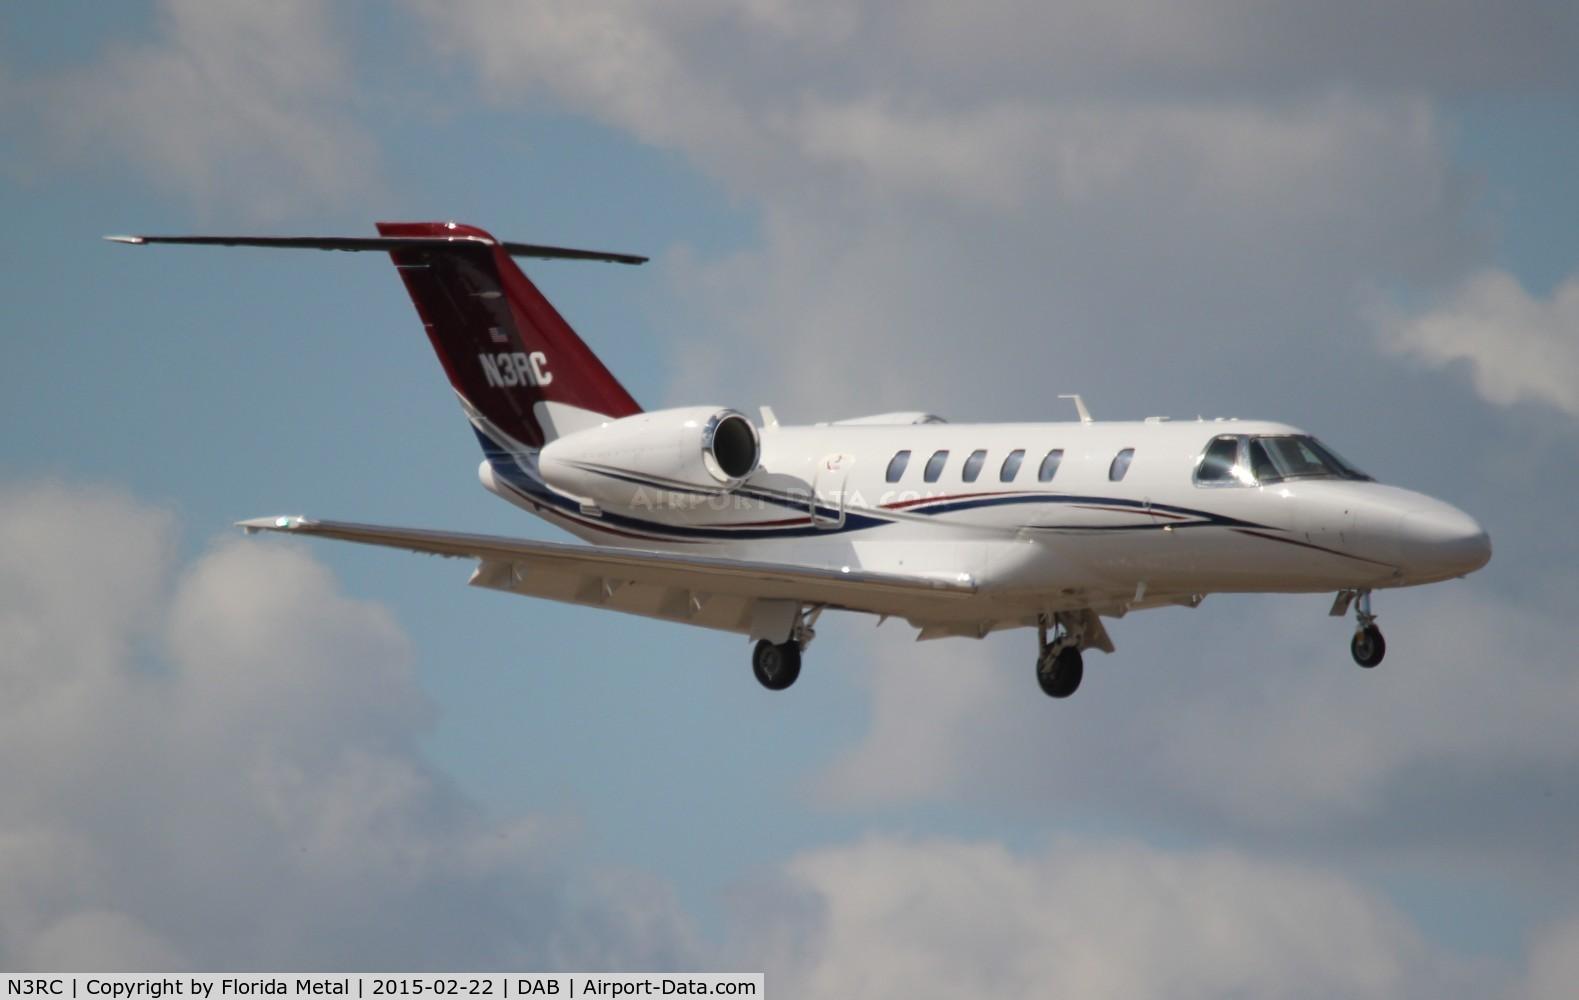 Aircraft N3rc 2011 Cessna 525c Citationjet Cj4 C N 525c